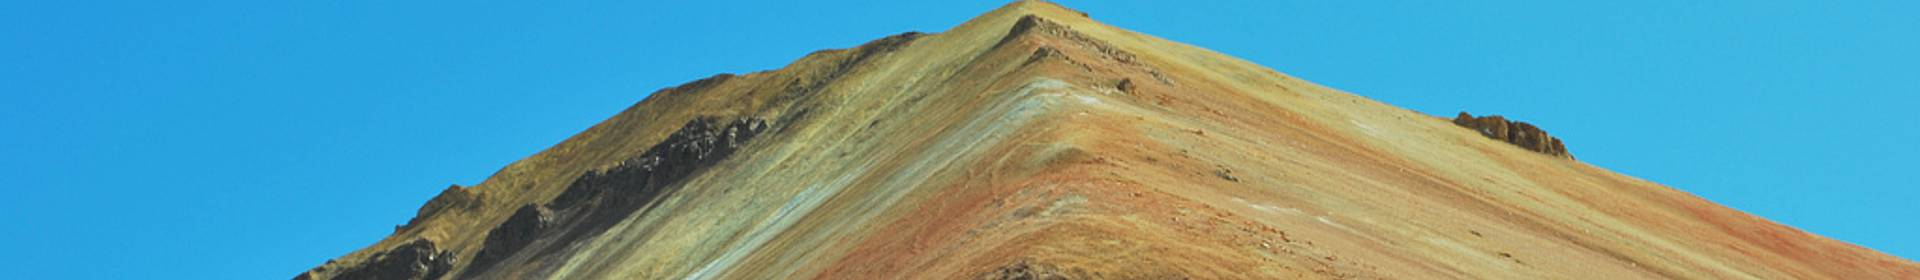 Volcán Tunupa